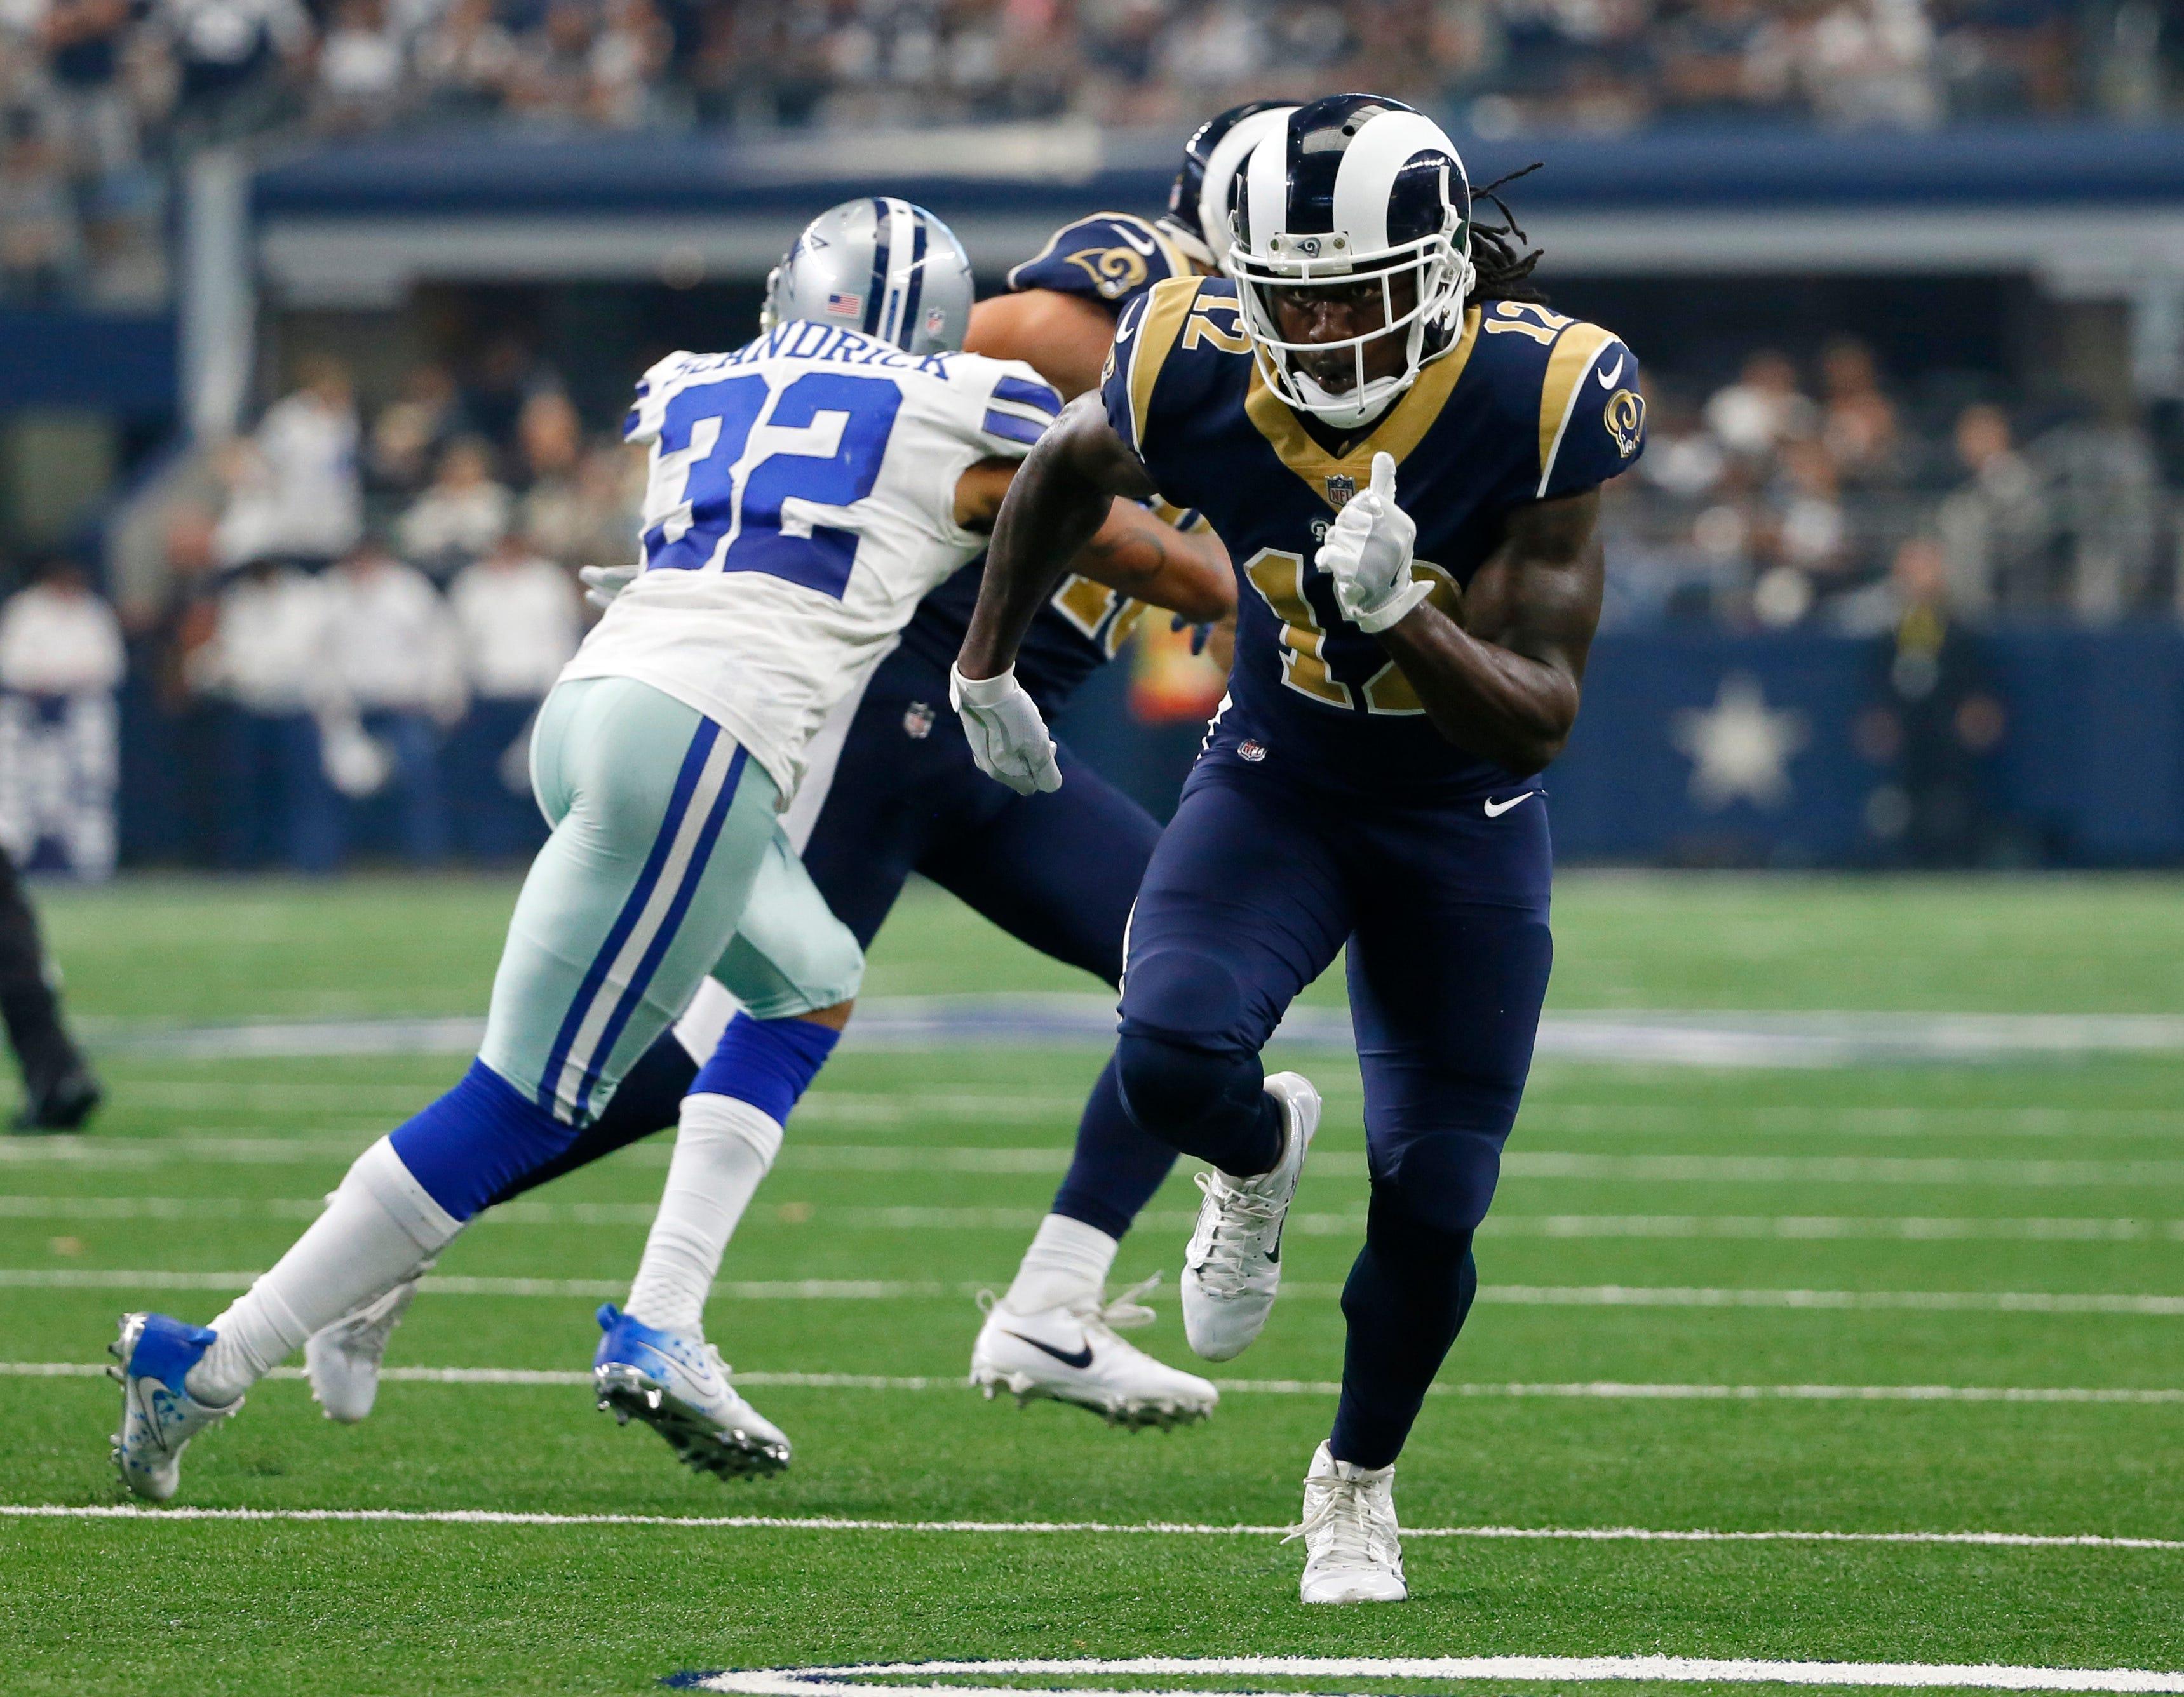 WR Watkins 'frustrated,' but still believes in Rams' offense